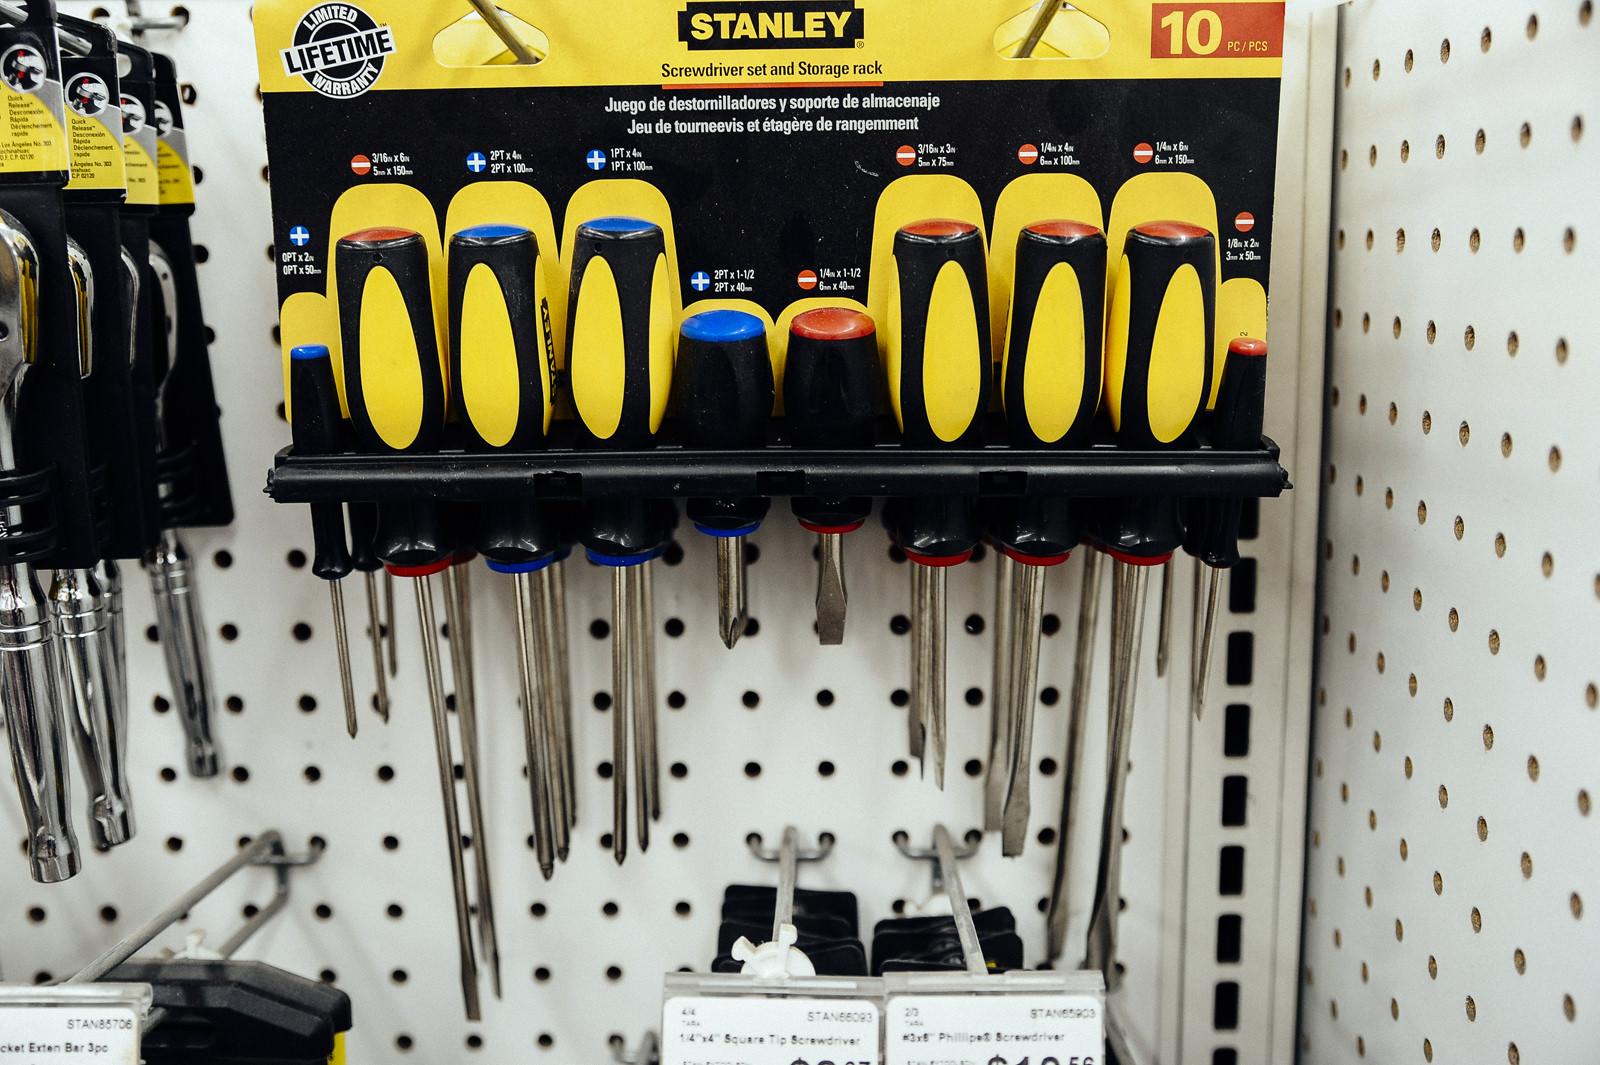 diy toolkit screwdriver